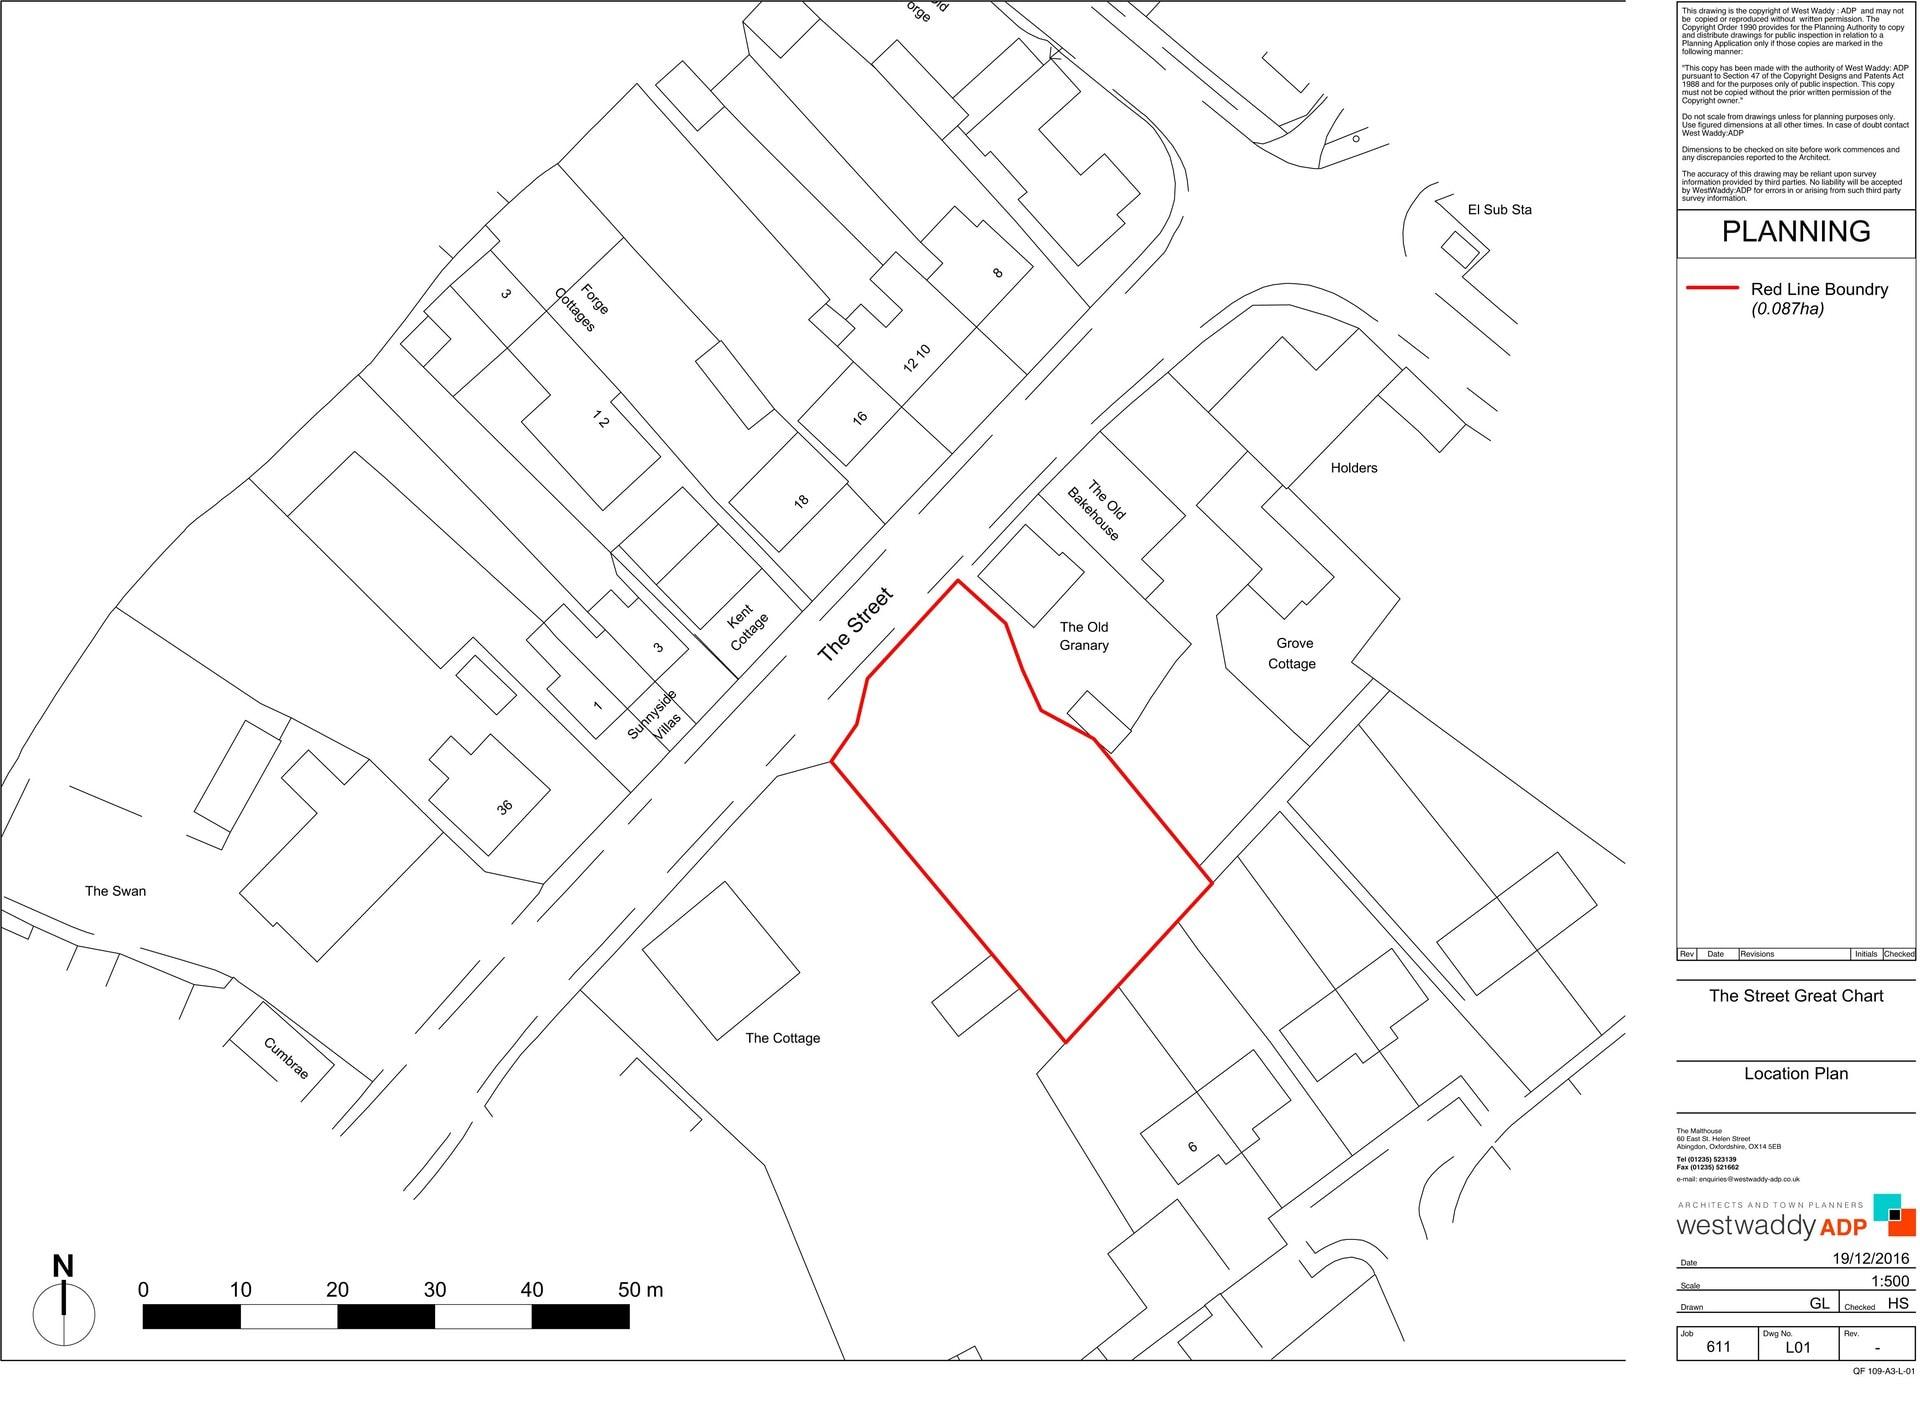 Great Chart Motors Location Plan